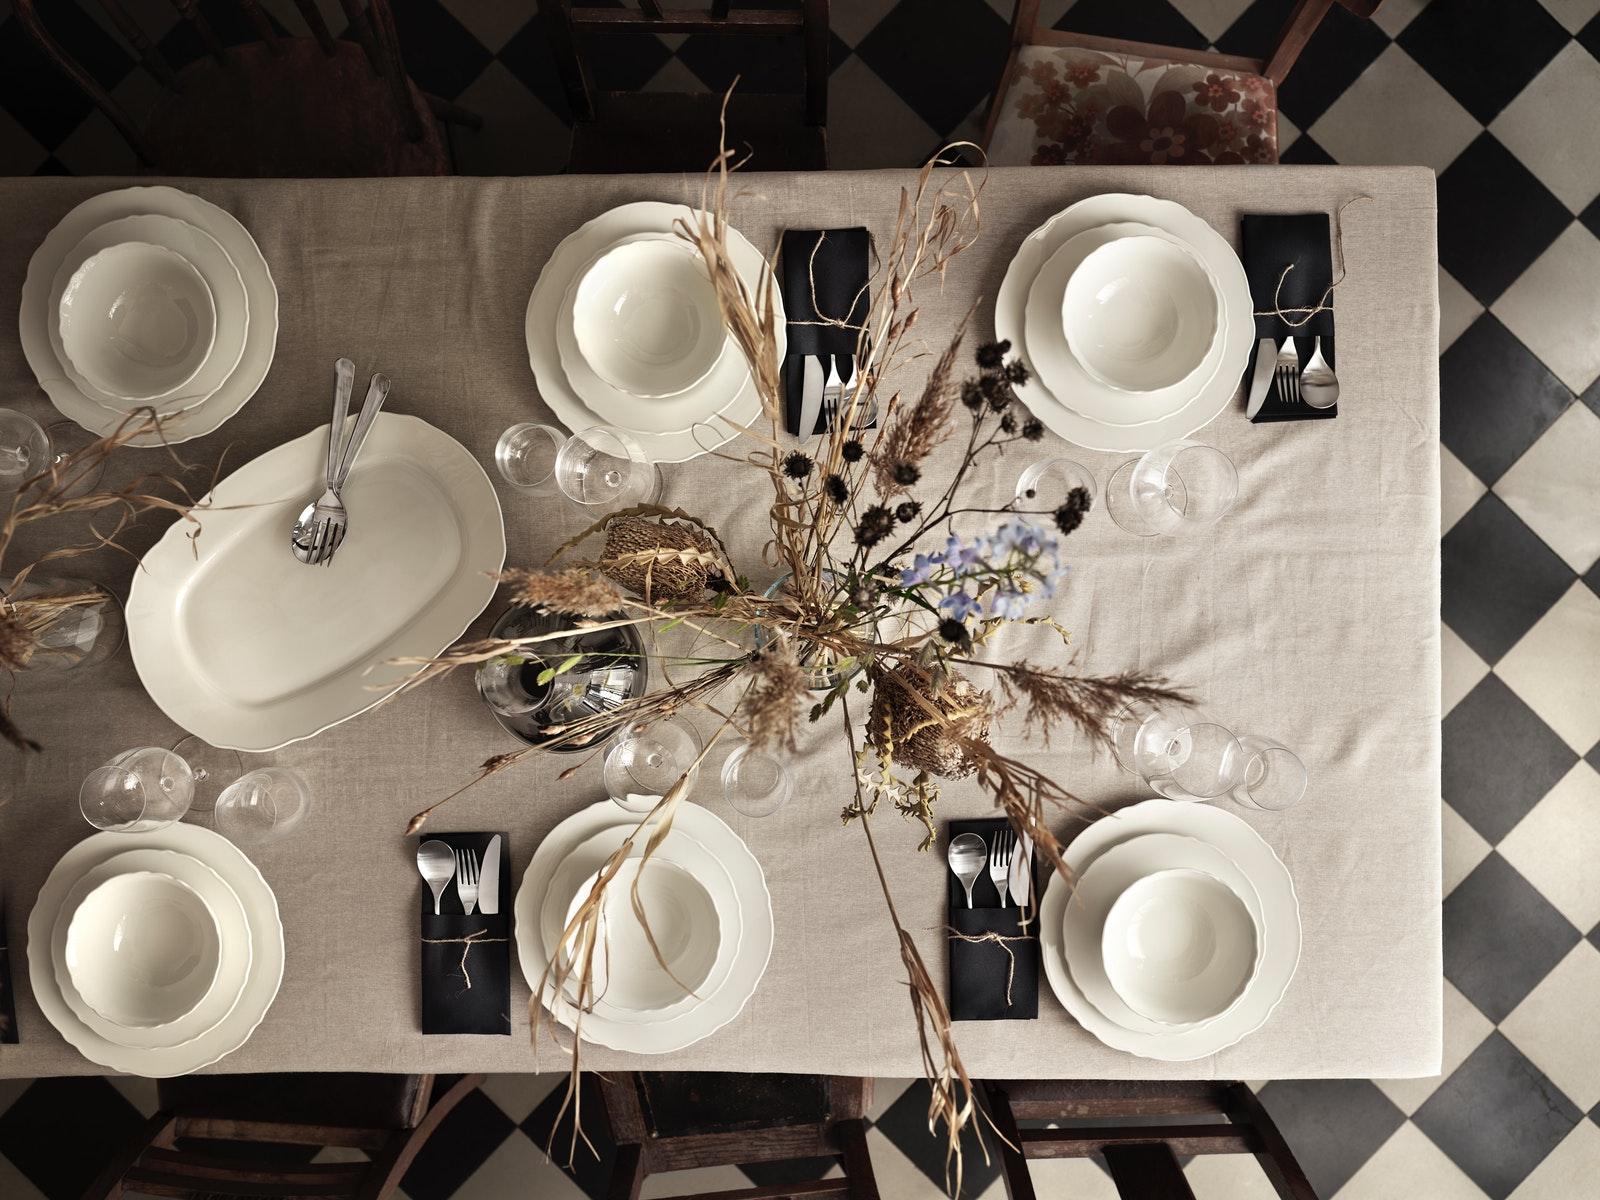 UPPLAGA瓷器系列的白瓷碗碟及杯放在木檯面上。